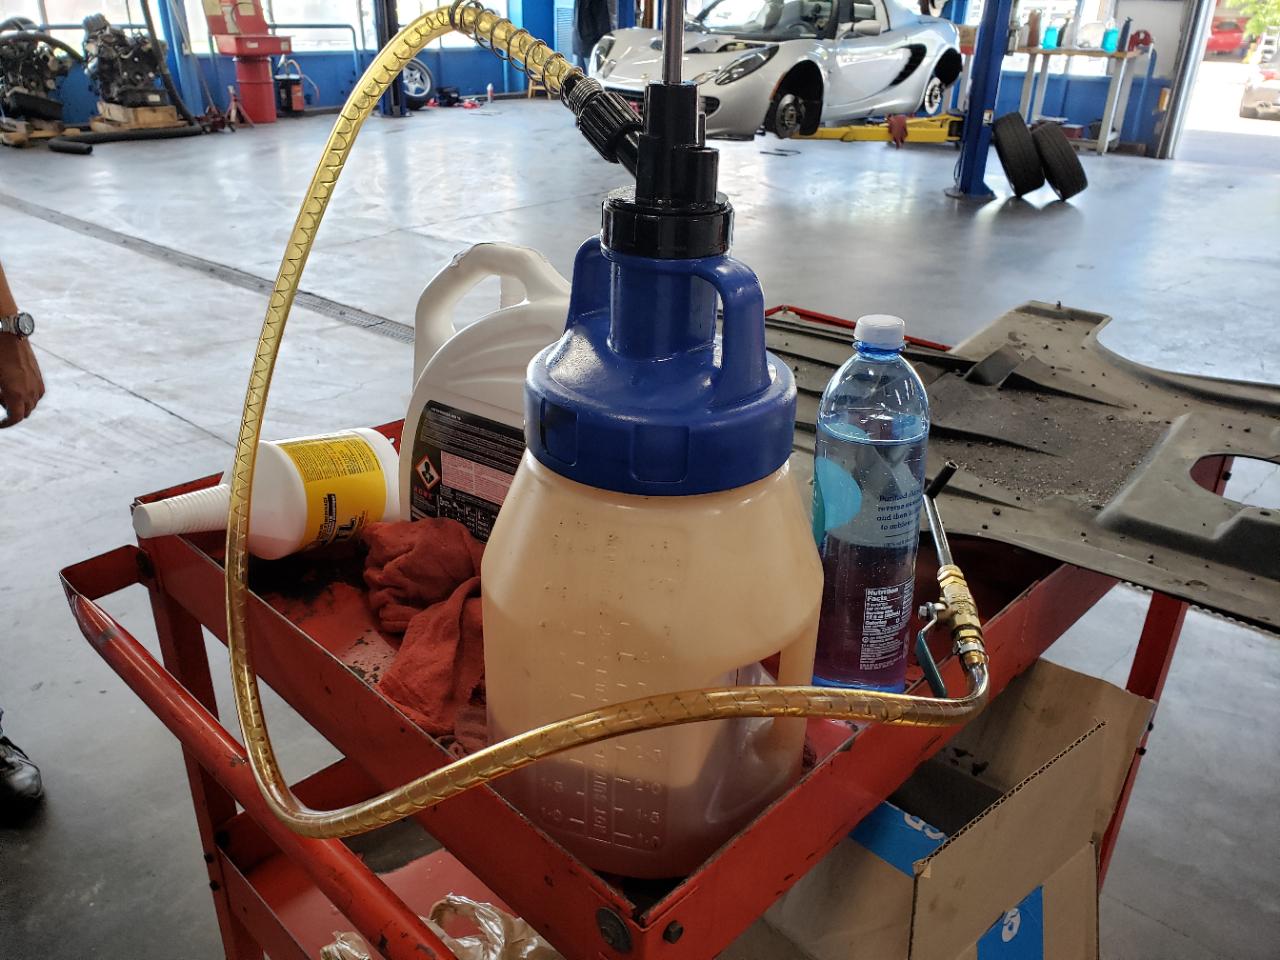 E39 M5 Transmission Fluid and Fuel Filter Changes - chrisparente com